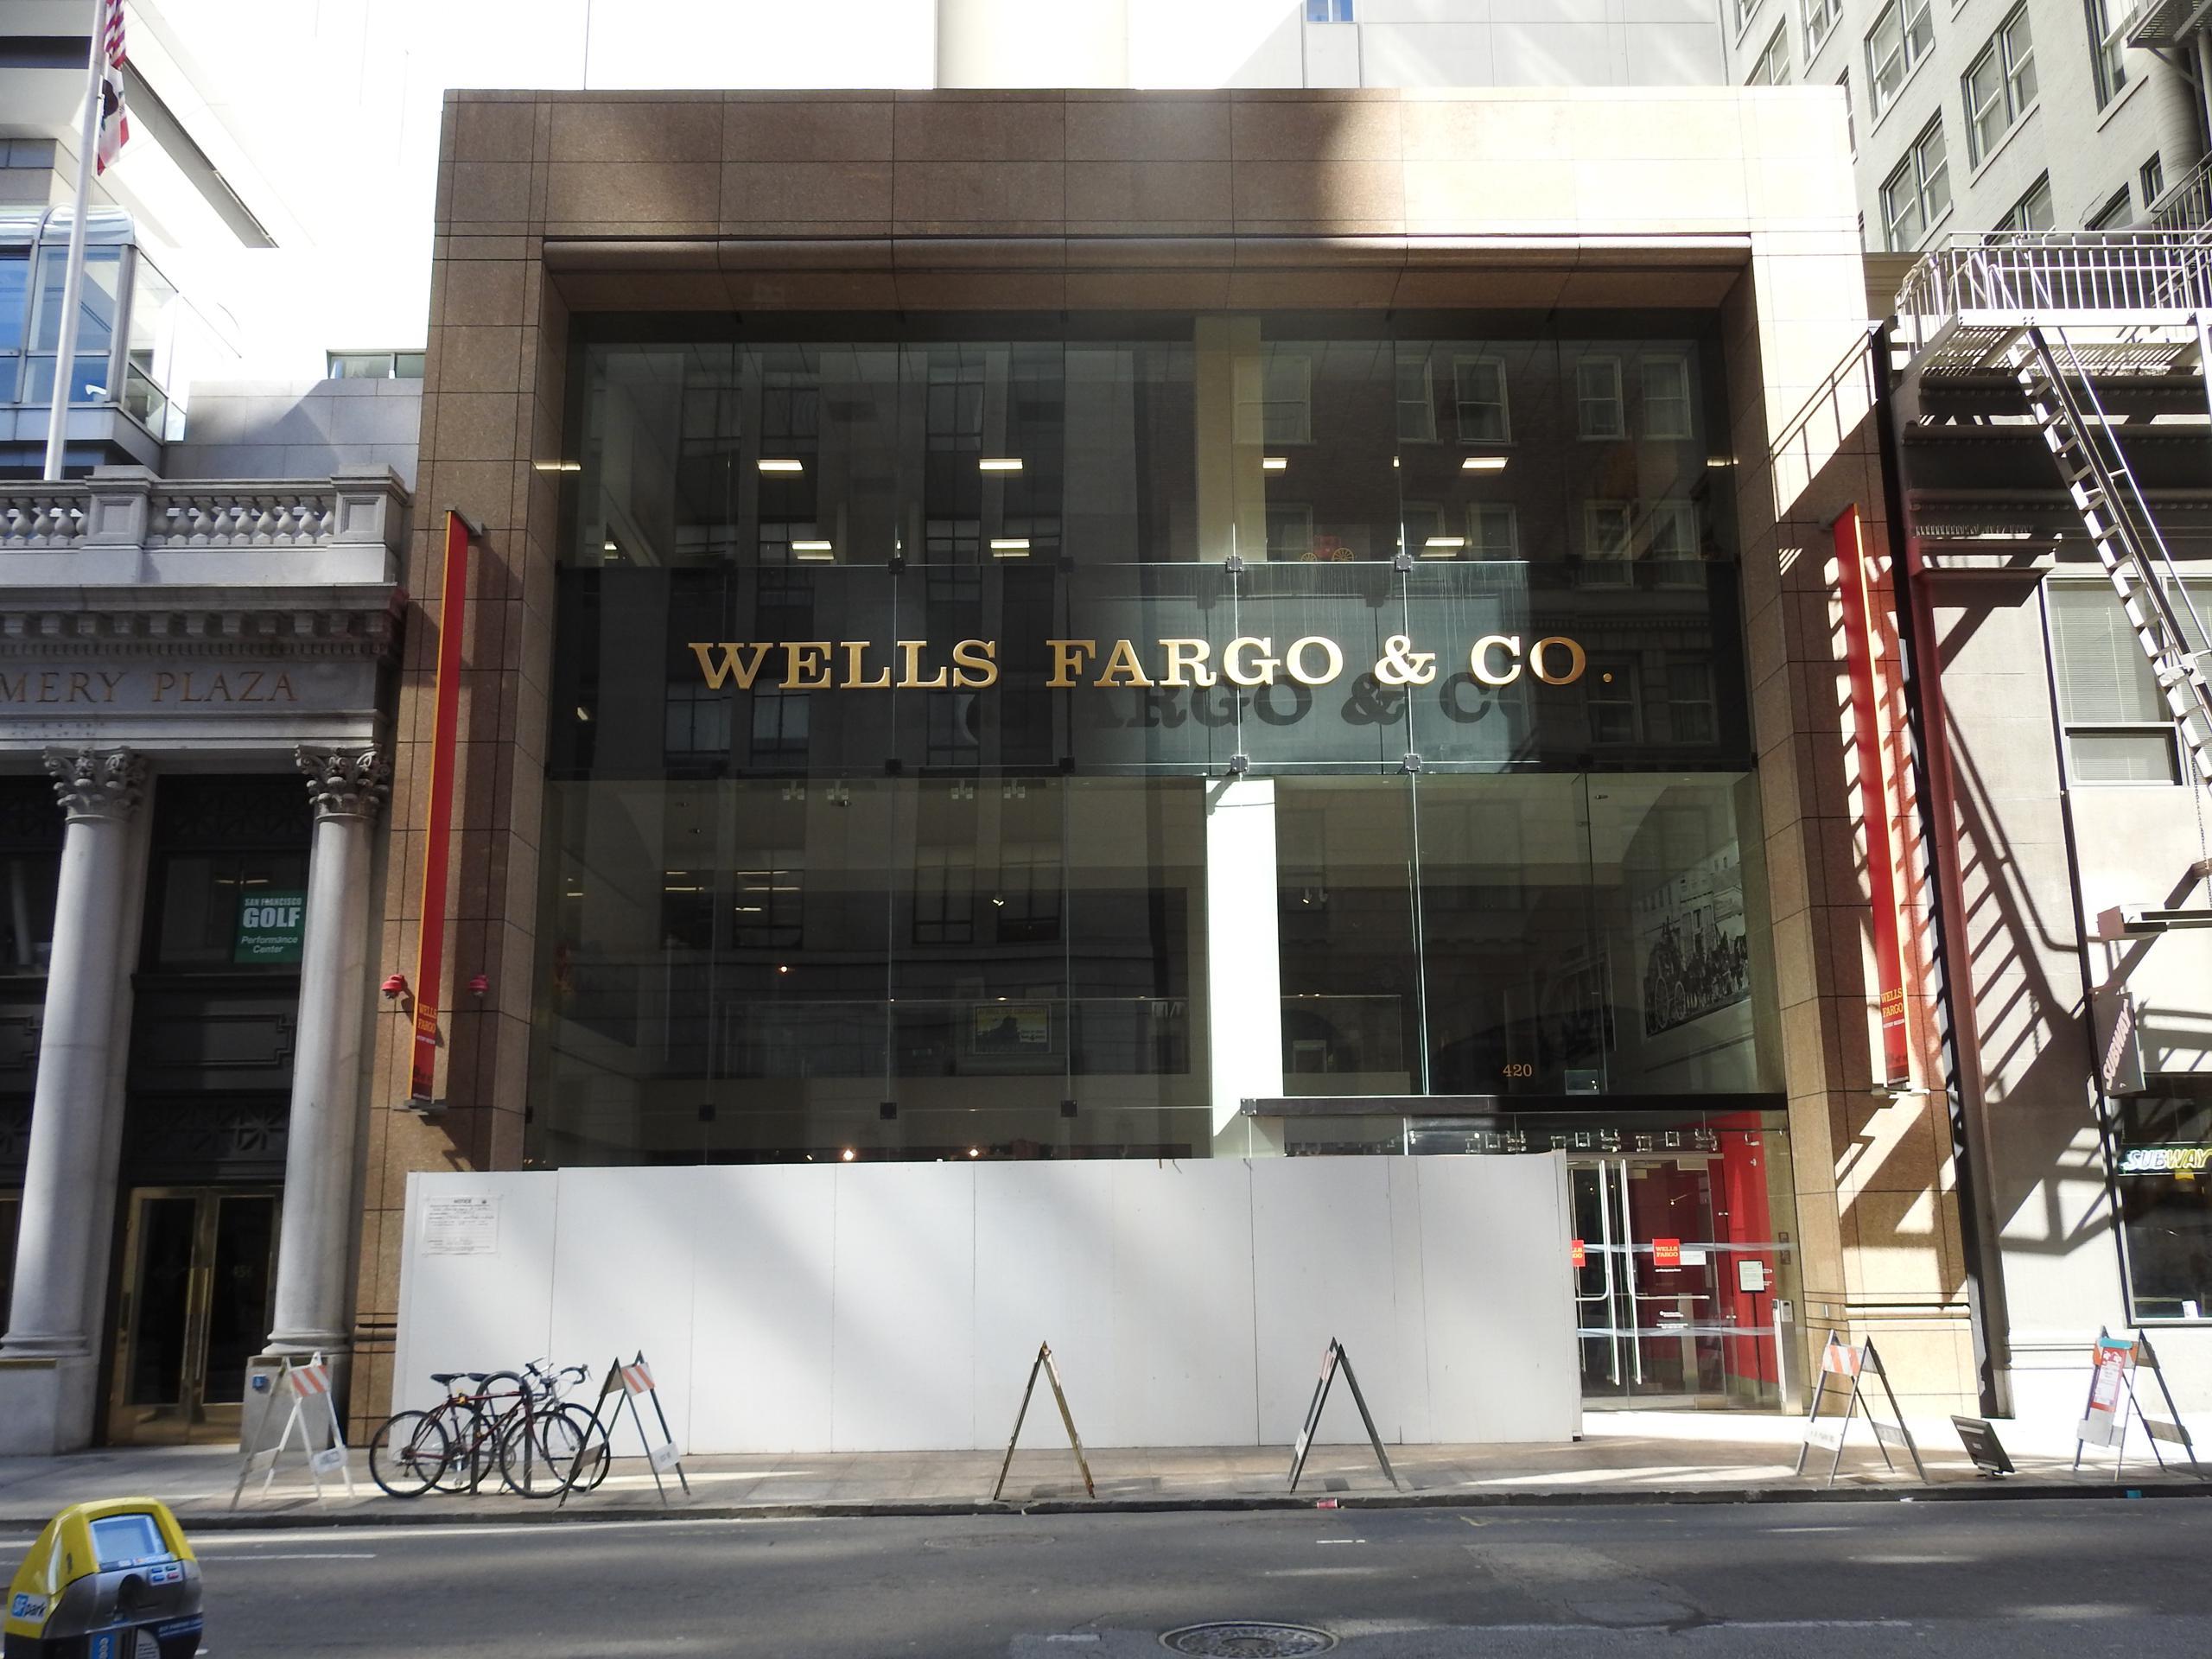 Wells Fargo's corporate headquarters in downtown San Francisco, California.